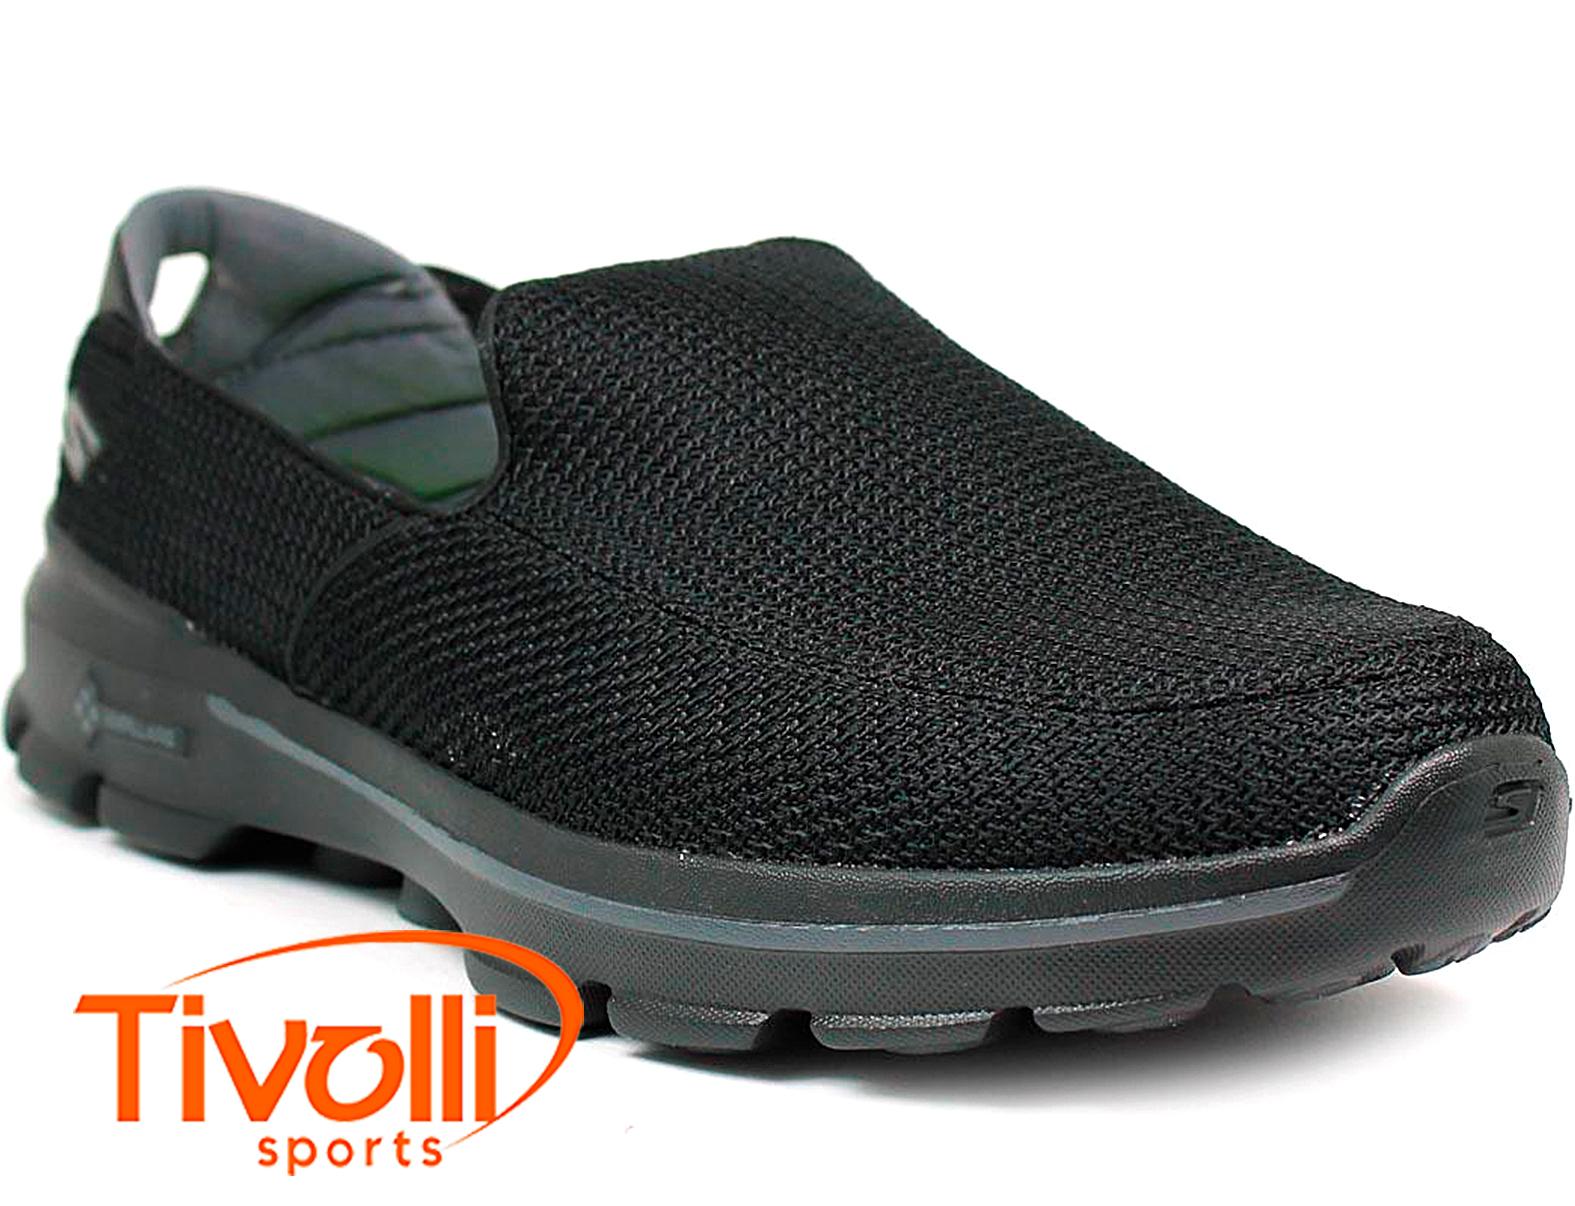 5ffb948f9 Tênis sapatilha Skechers   Go Walk 3 Mesh Slip-on Preto